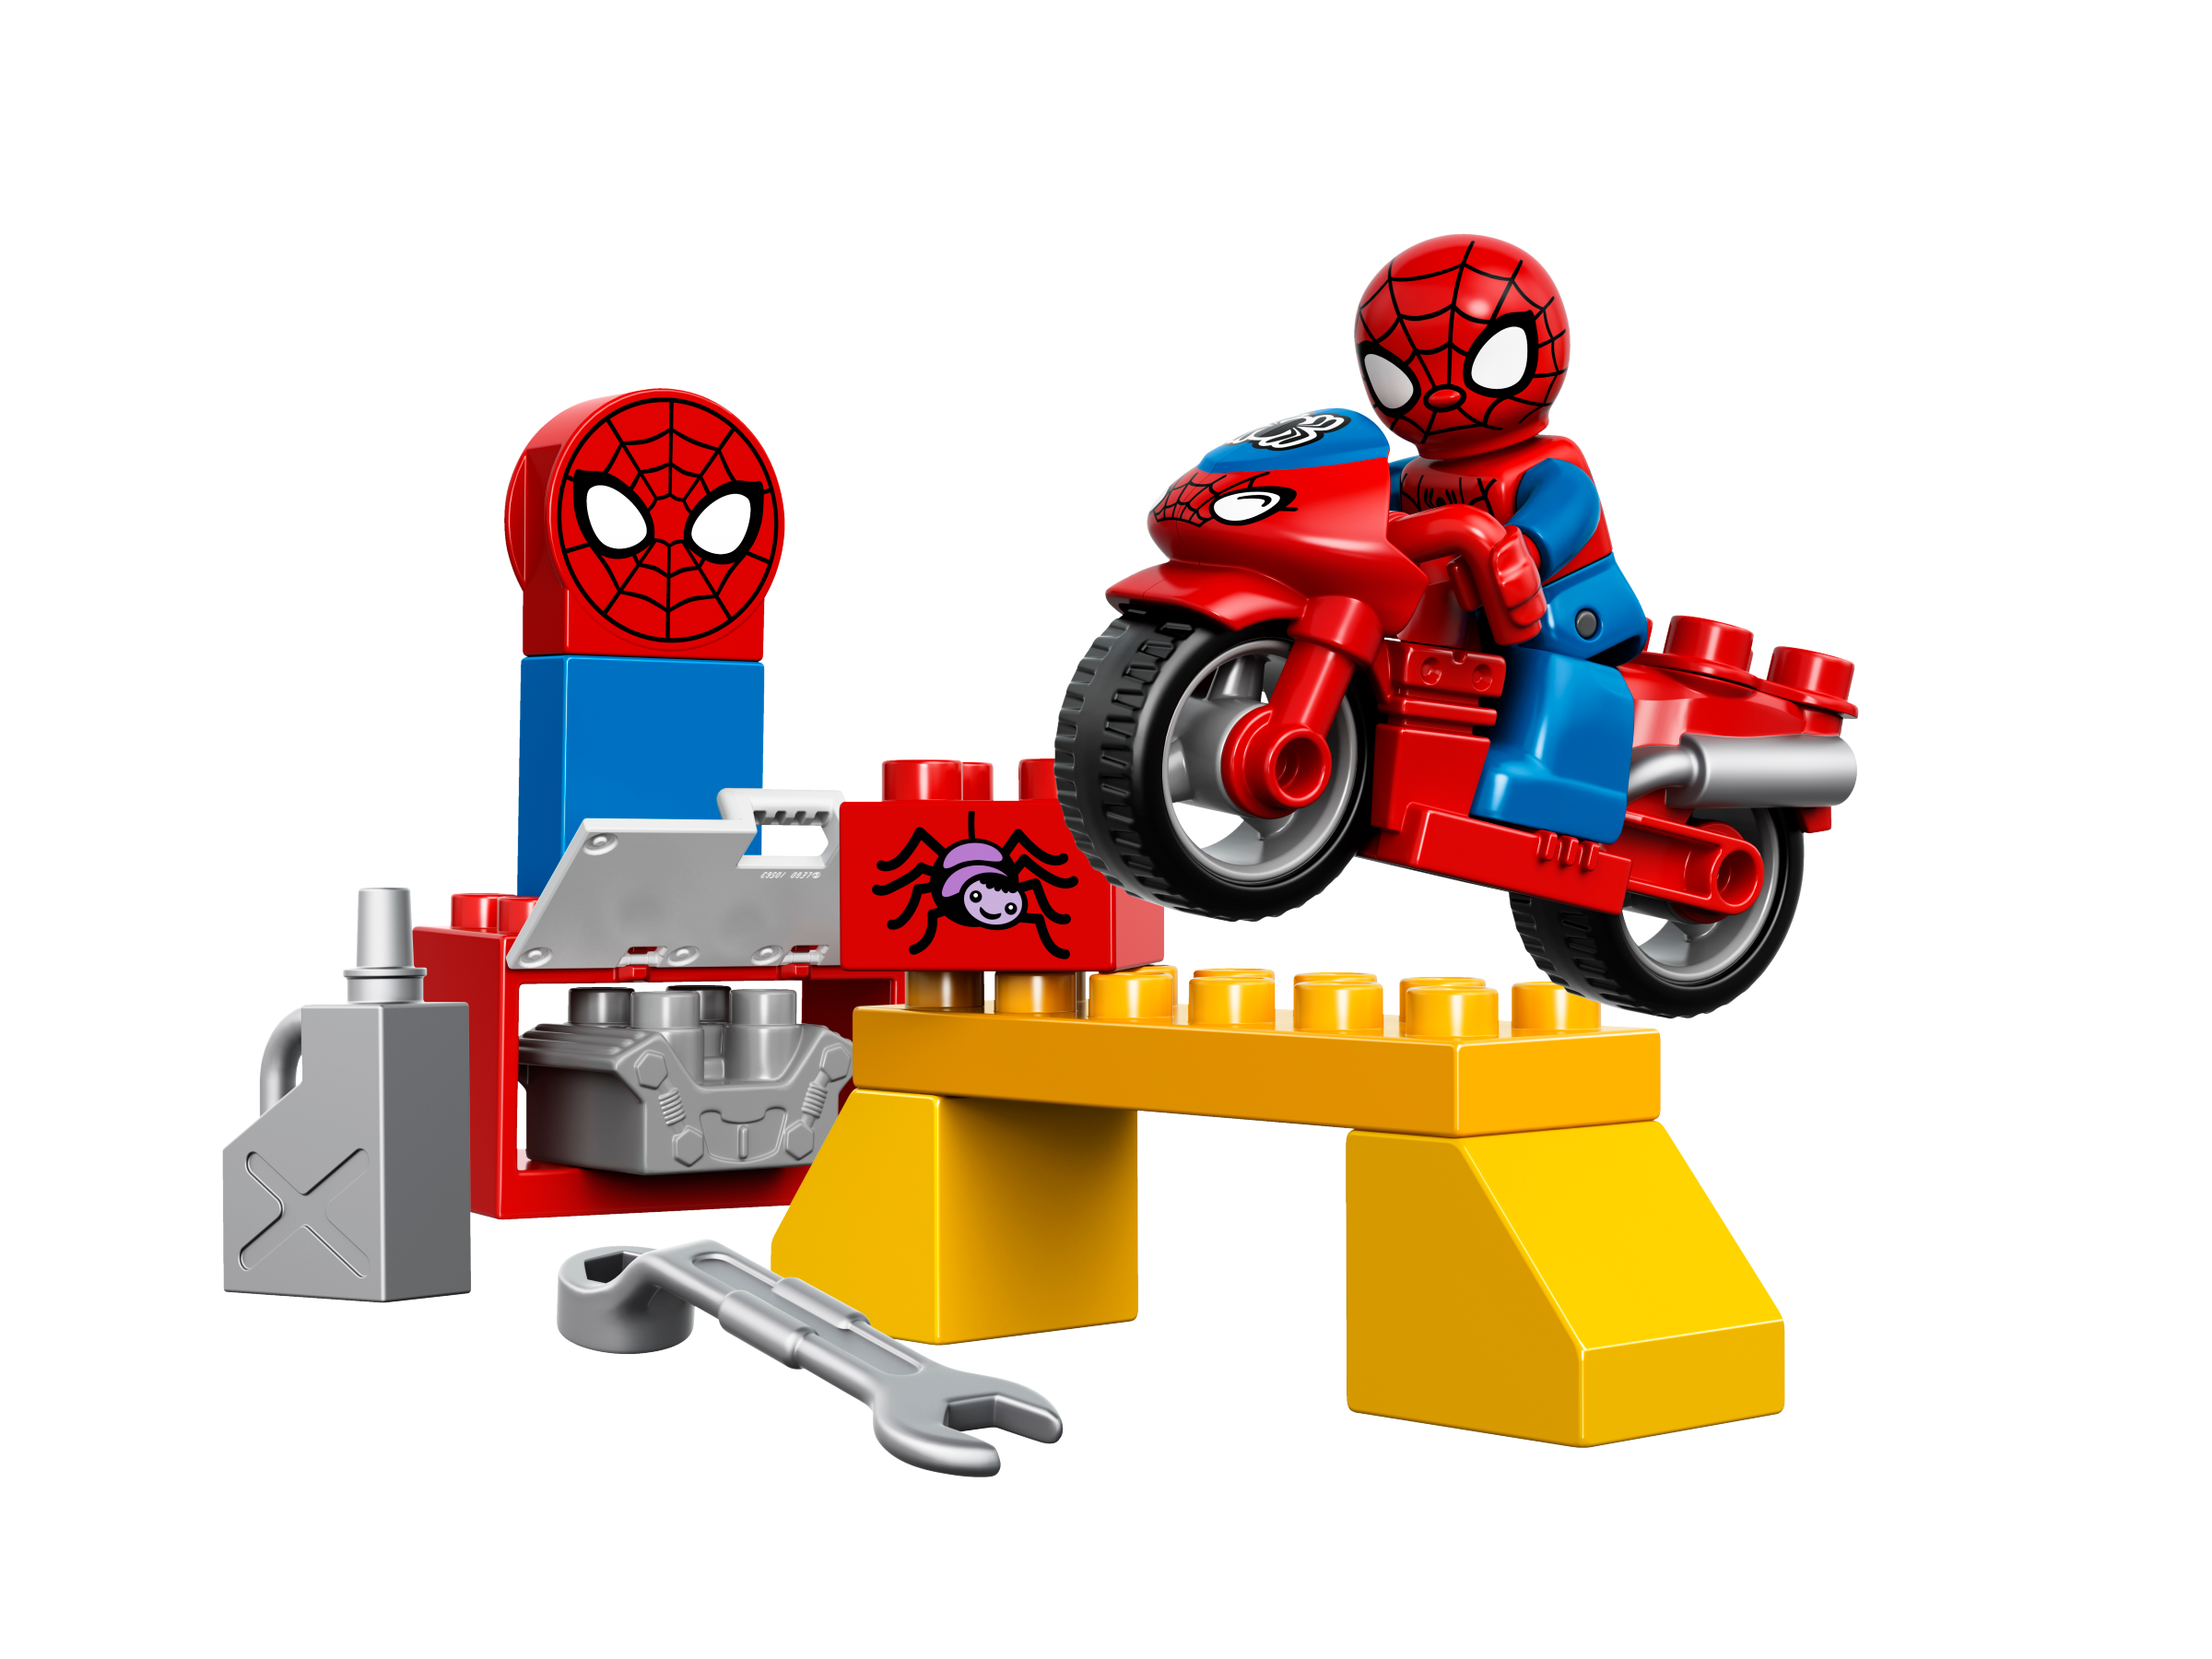 Legos clipart duplo block. Spider man web bike